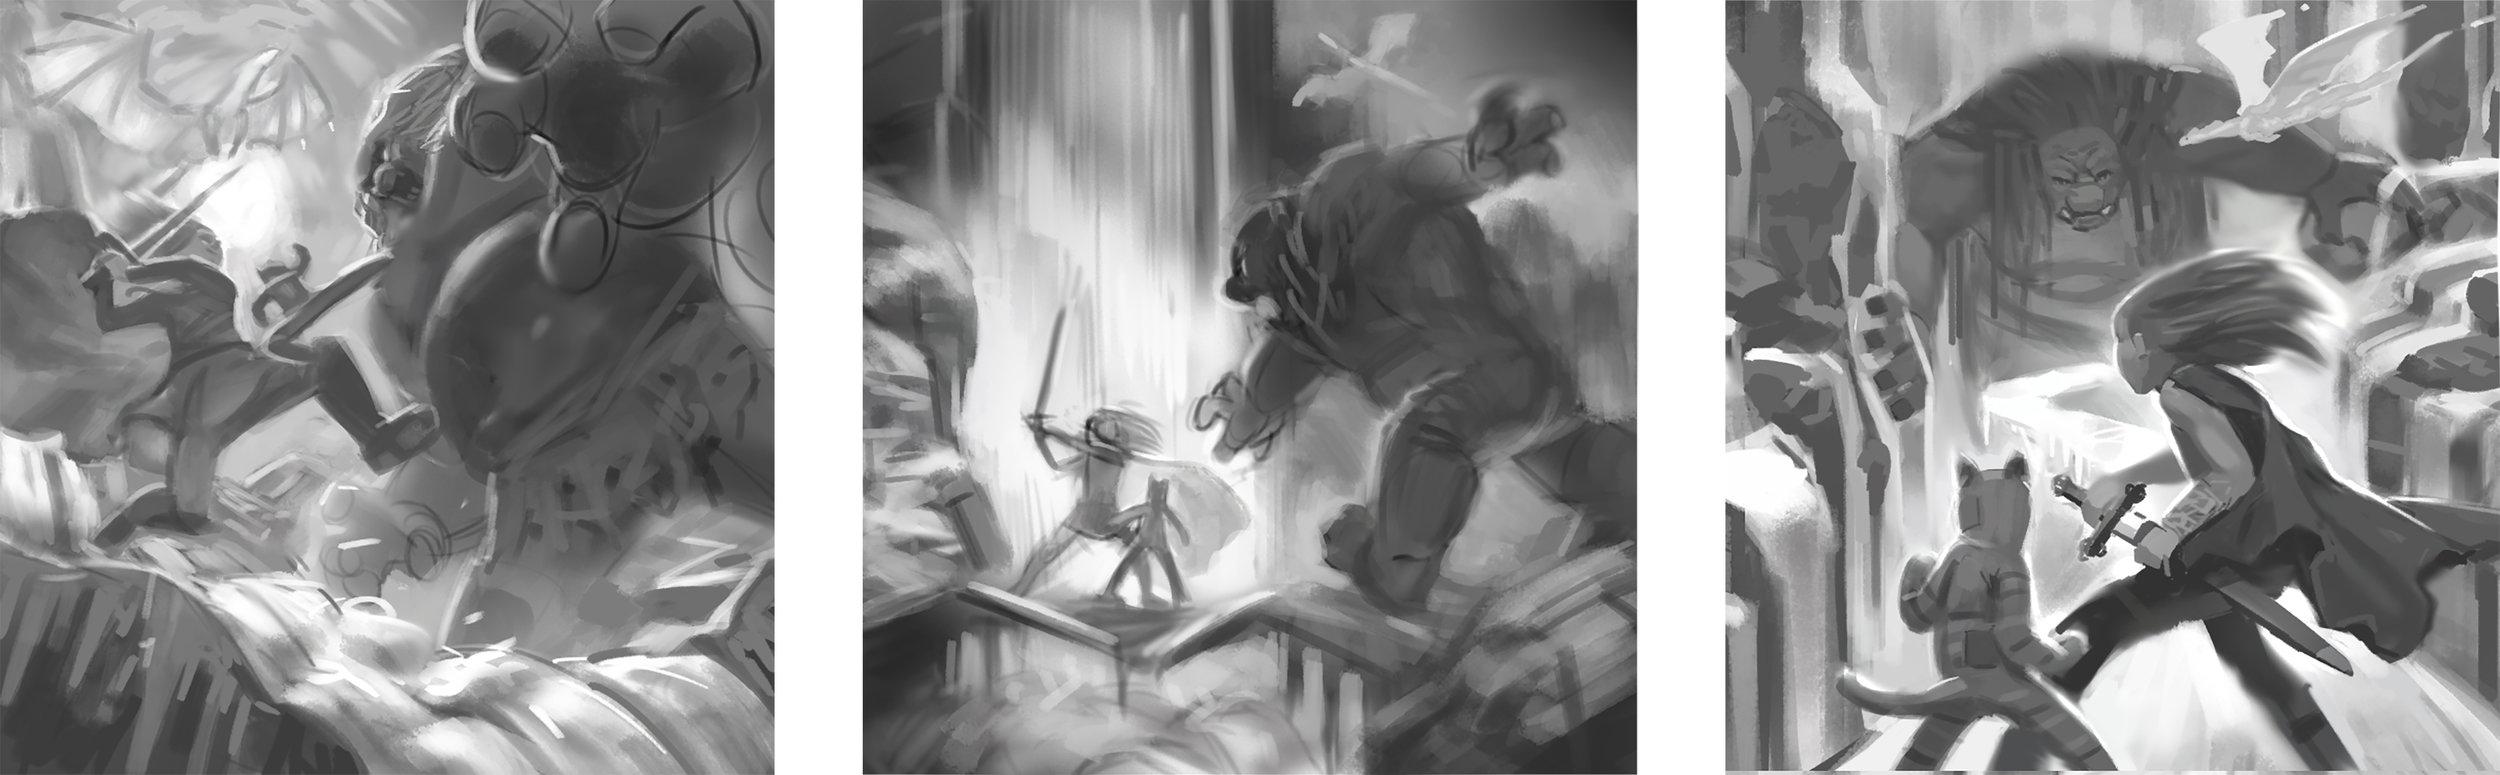 troll-bridge-sketch.jpg